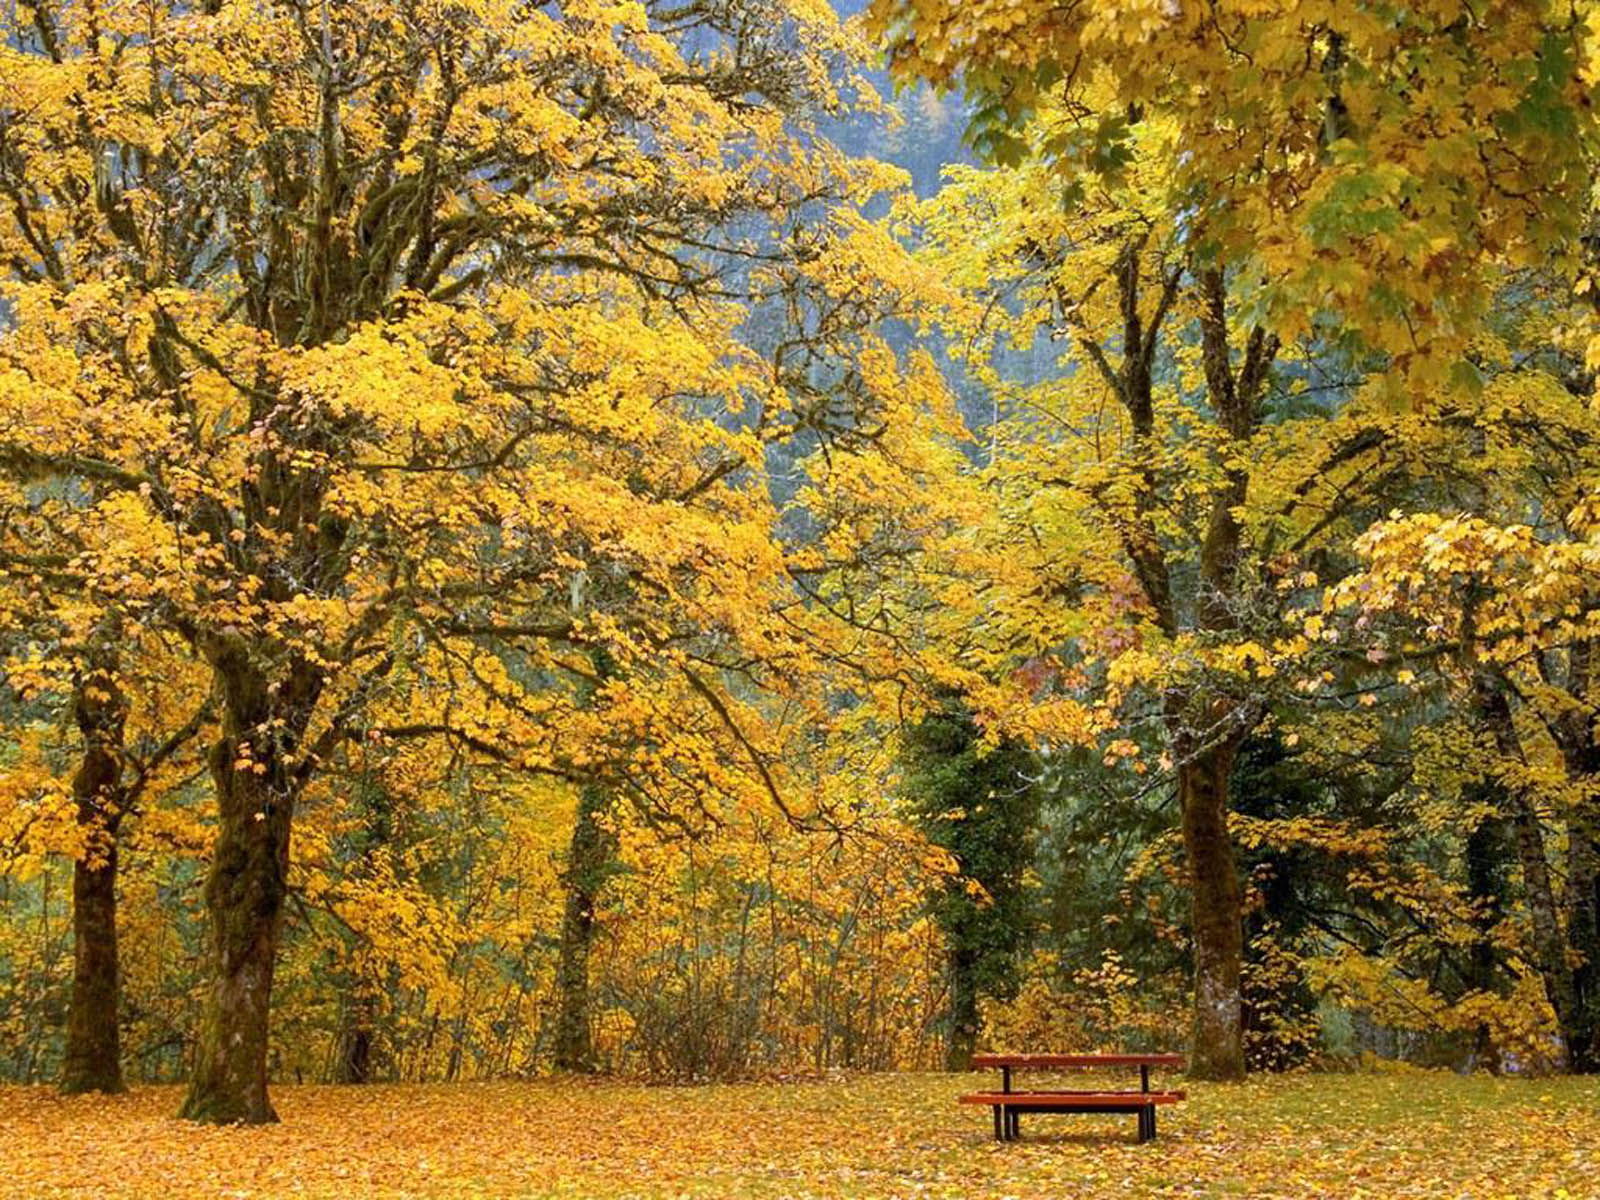 Autumn Scenery Wallpapers Beautiful Autumn Scenery Desktop Wallpapers 1600x1200